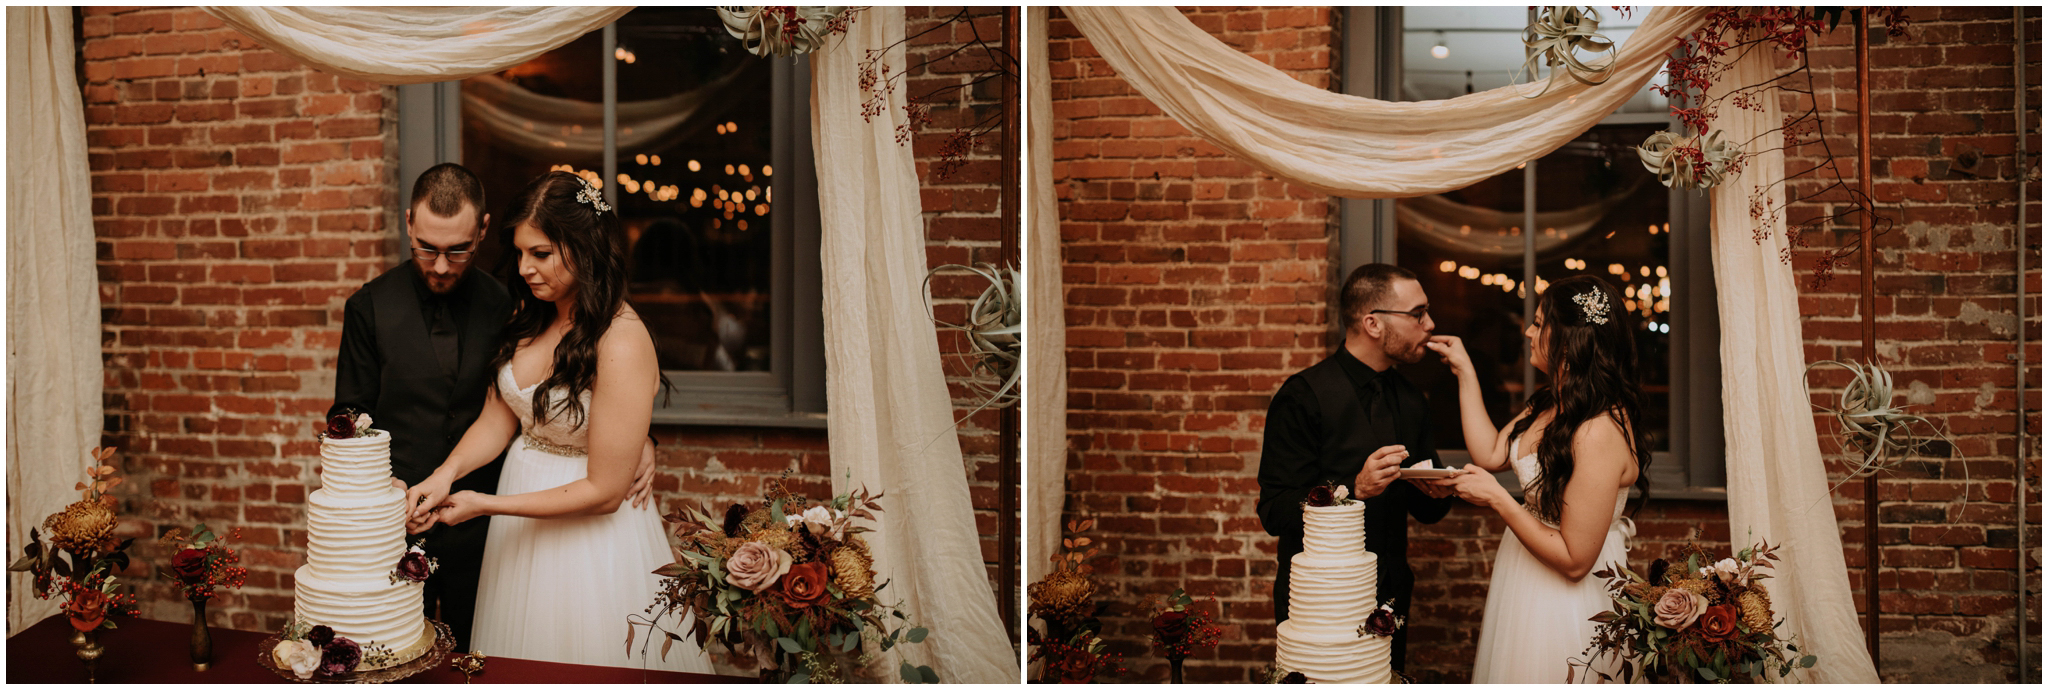 danny+mackenzie+downtown-seattle-axis-wedding-seattle-photographer-110.jpg